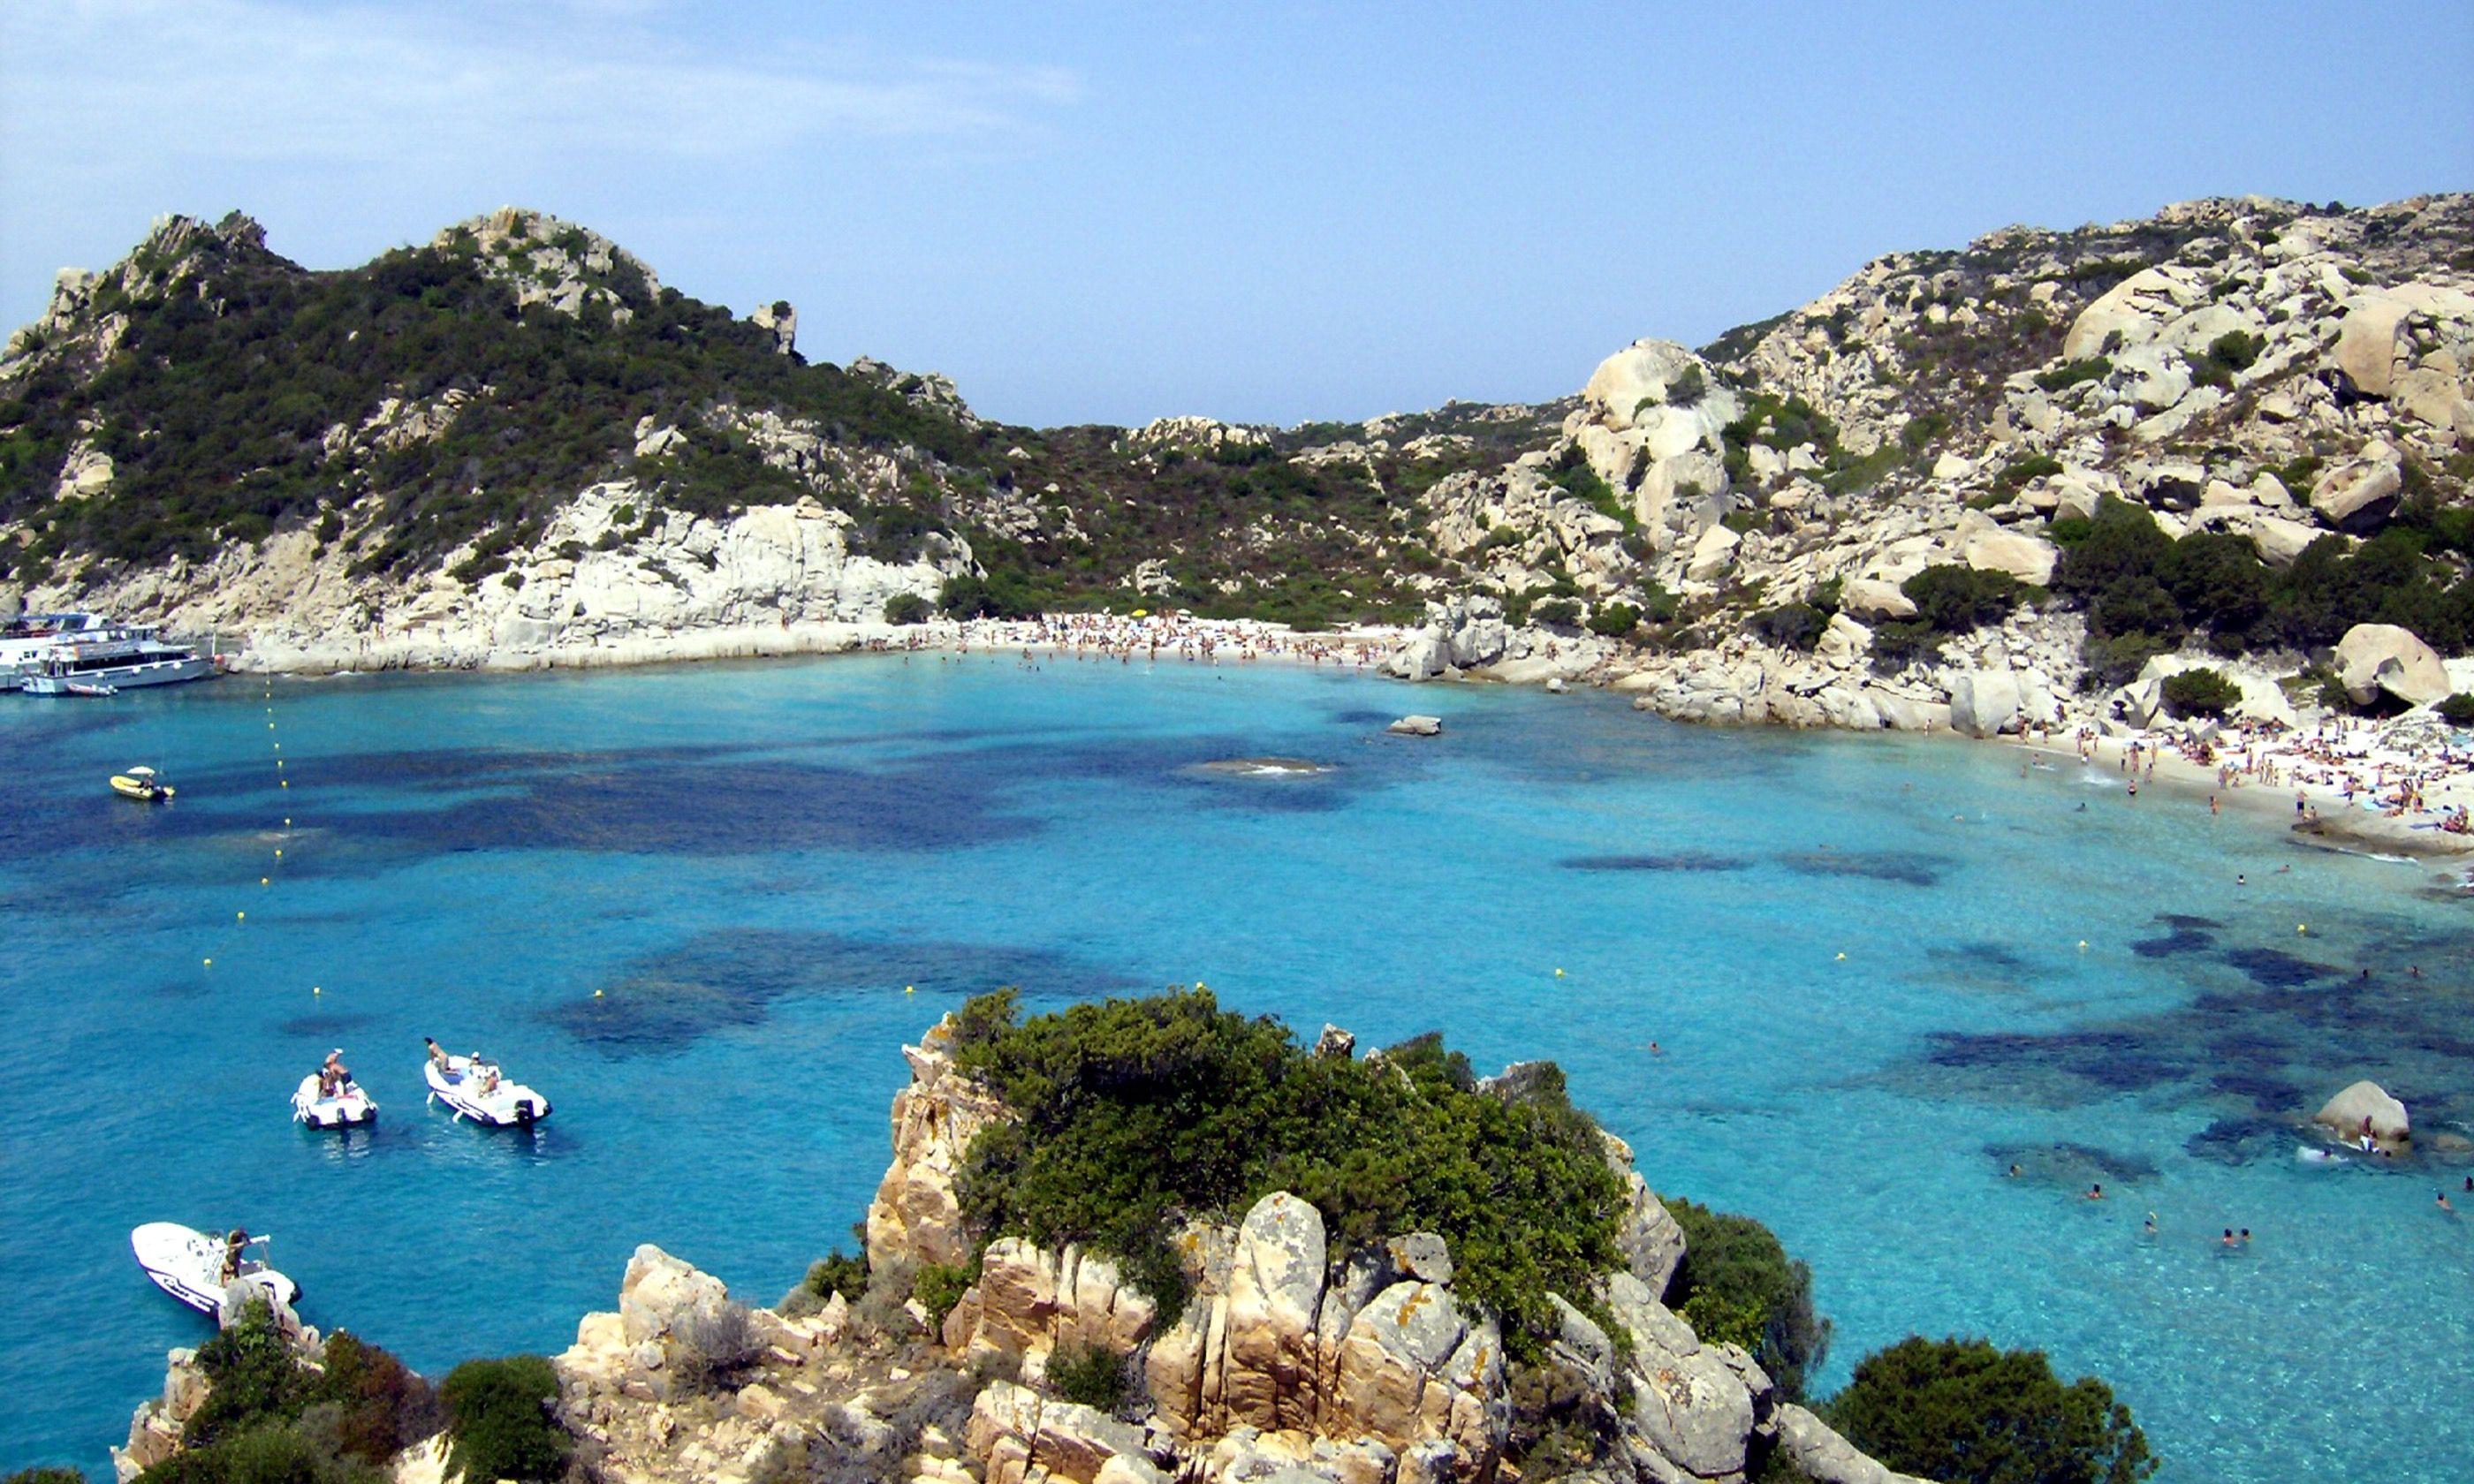 Cala Consara, Sardinia (Dreamstime)